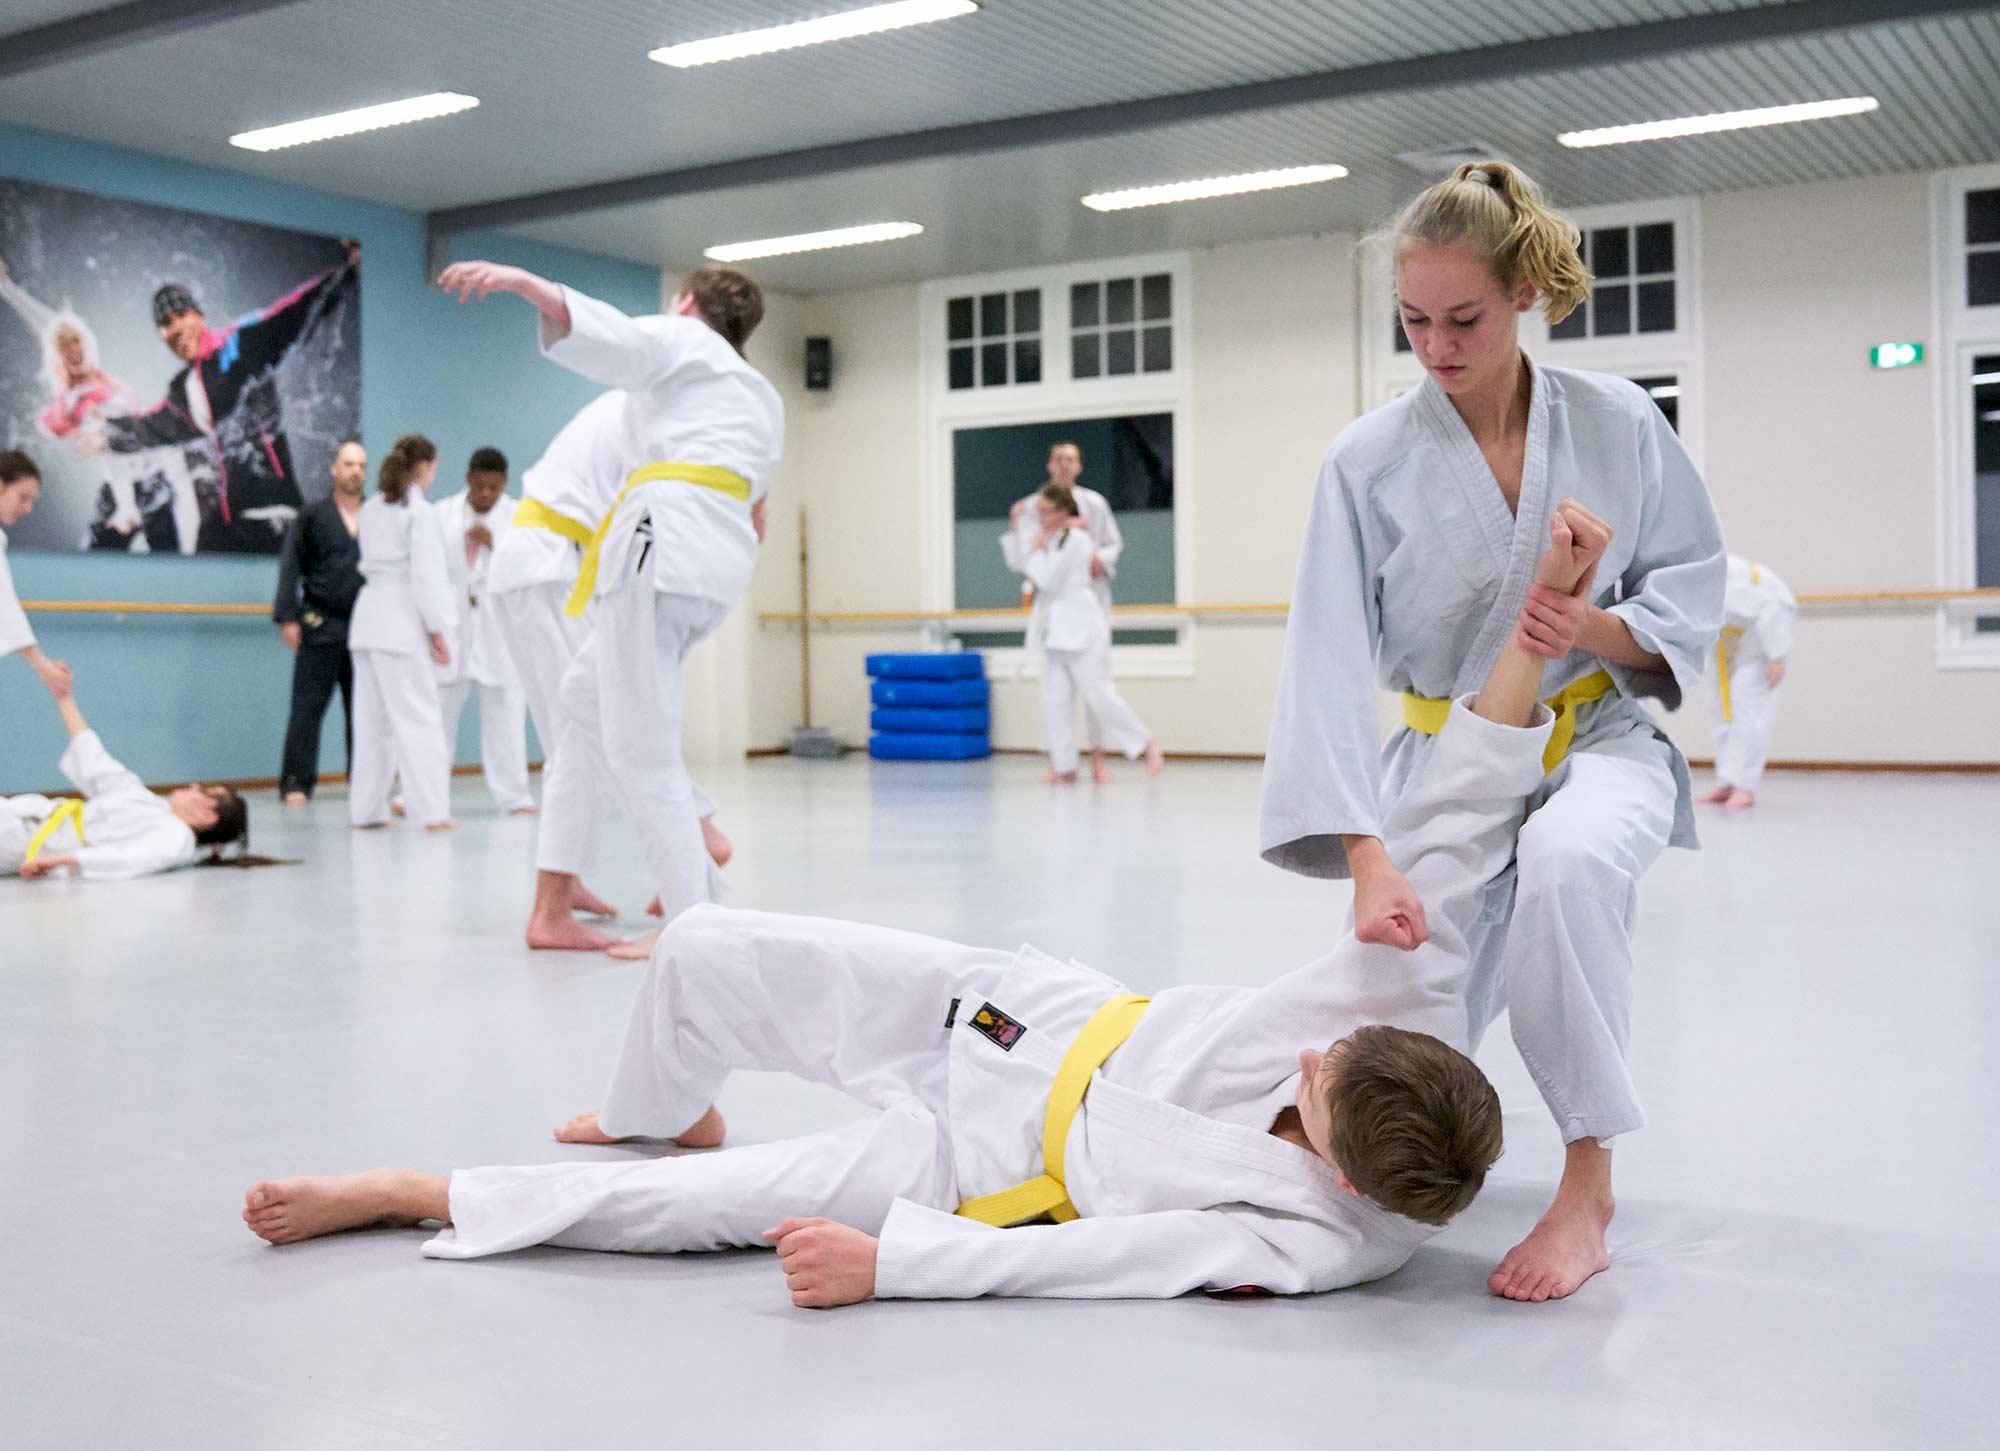 cursus zelfverdediging frist van der werff